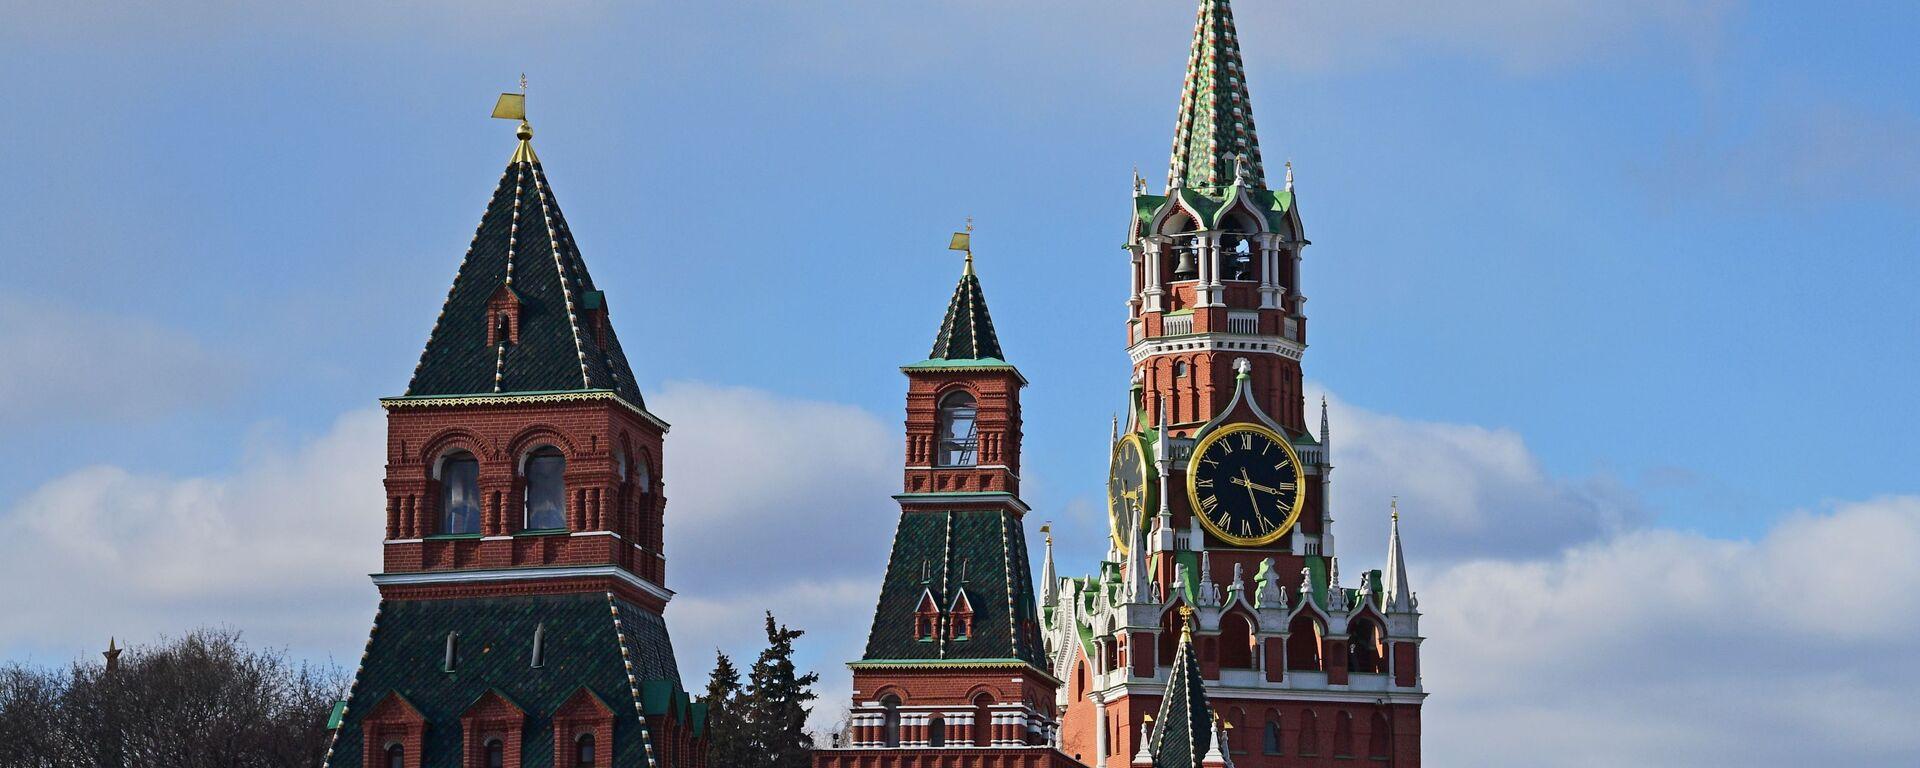 El Kremlin de Moscú - Sputnik Mundo, 1920, 31.03.2021